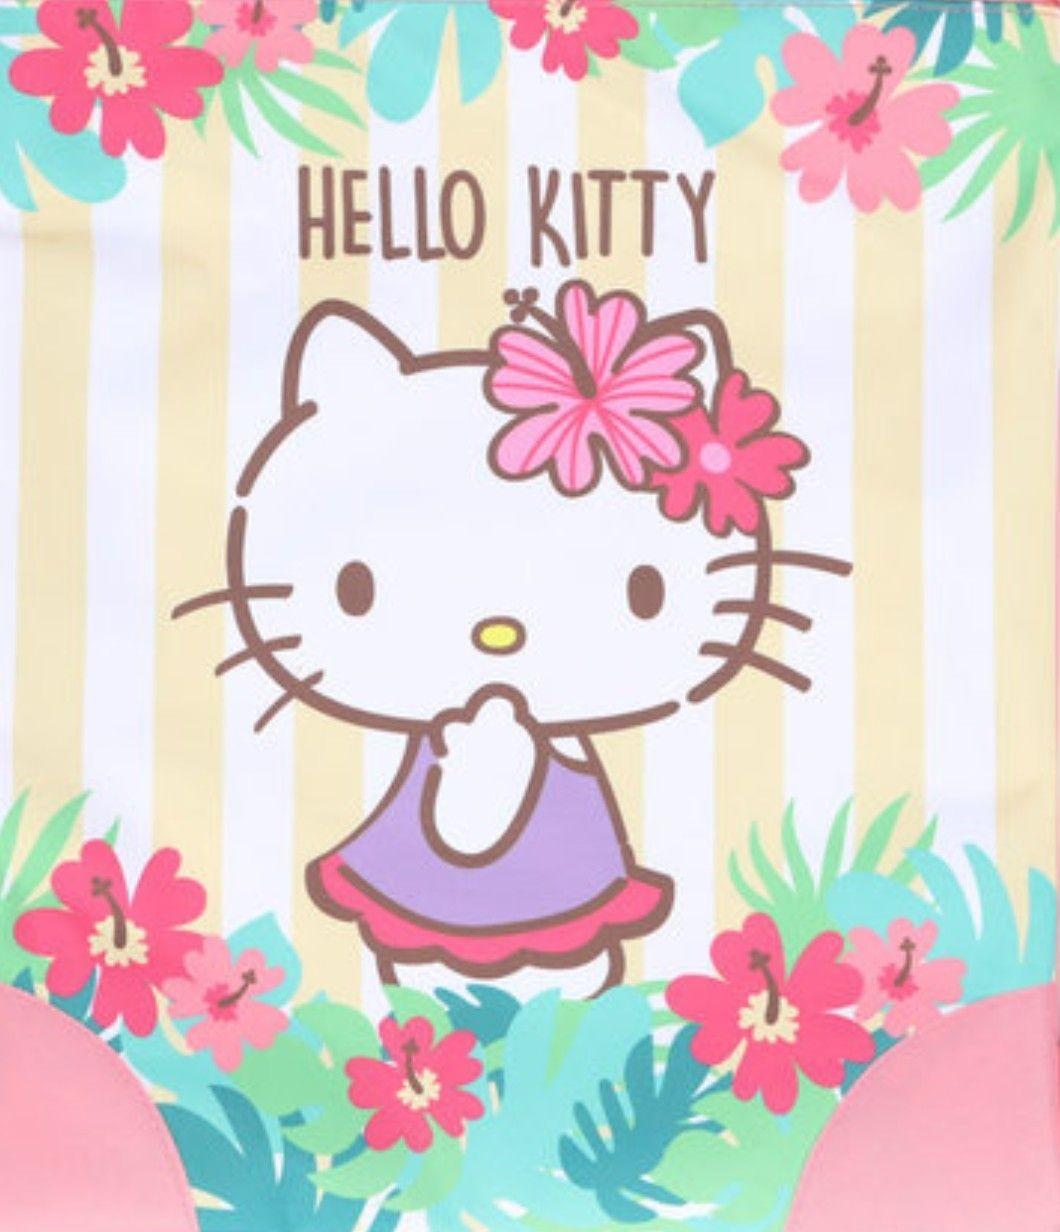 Printable Hello Kitty Papercraft - Printable Papercrafts